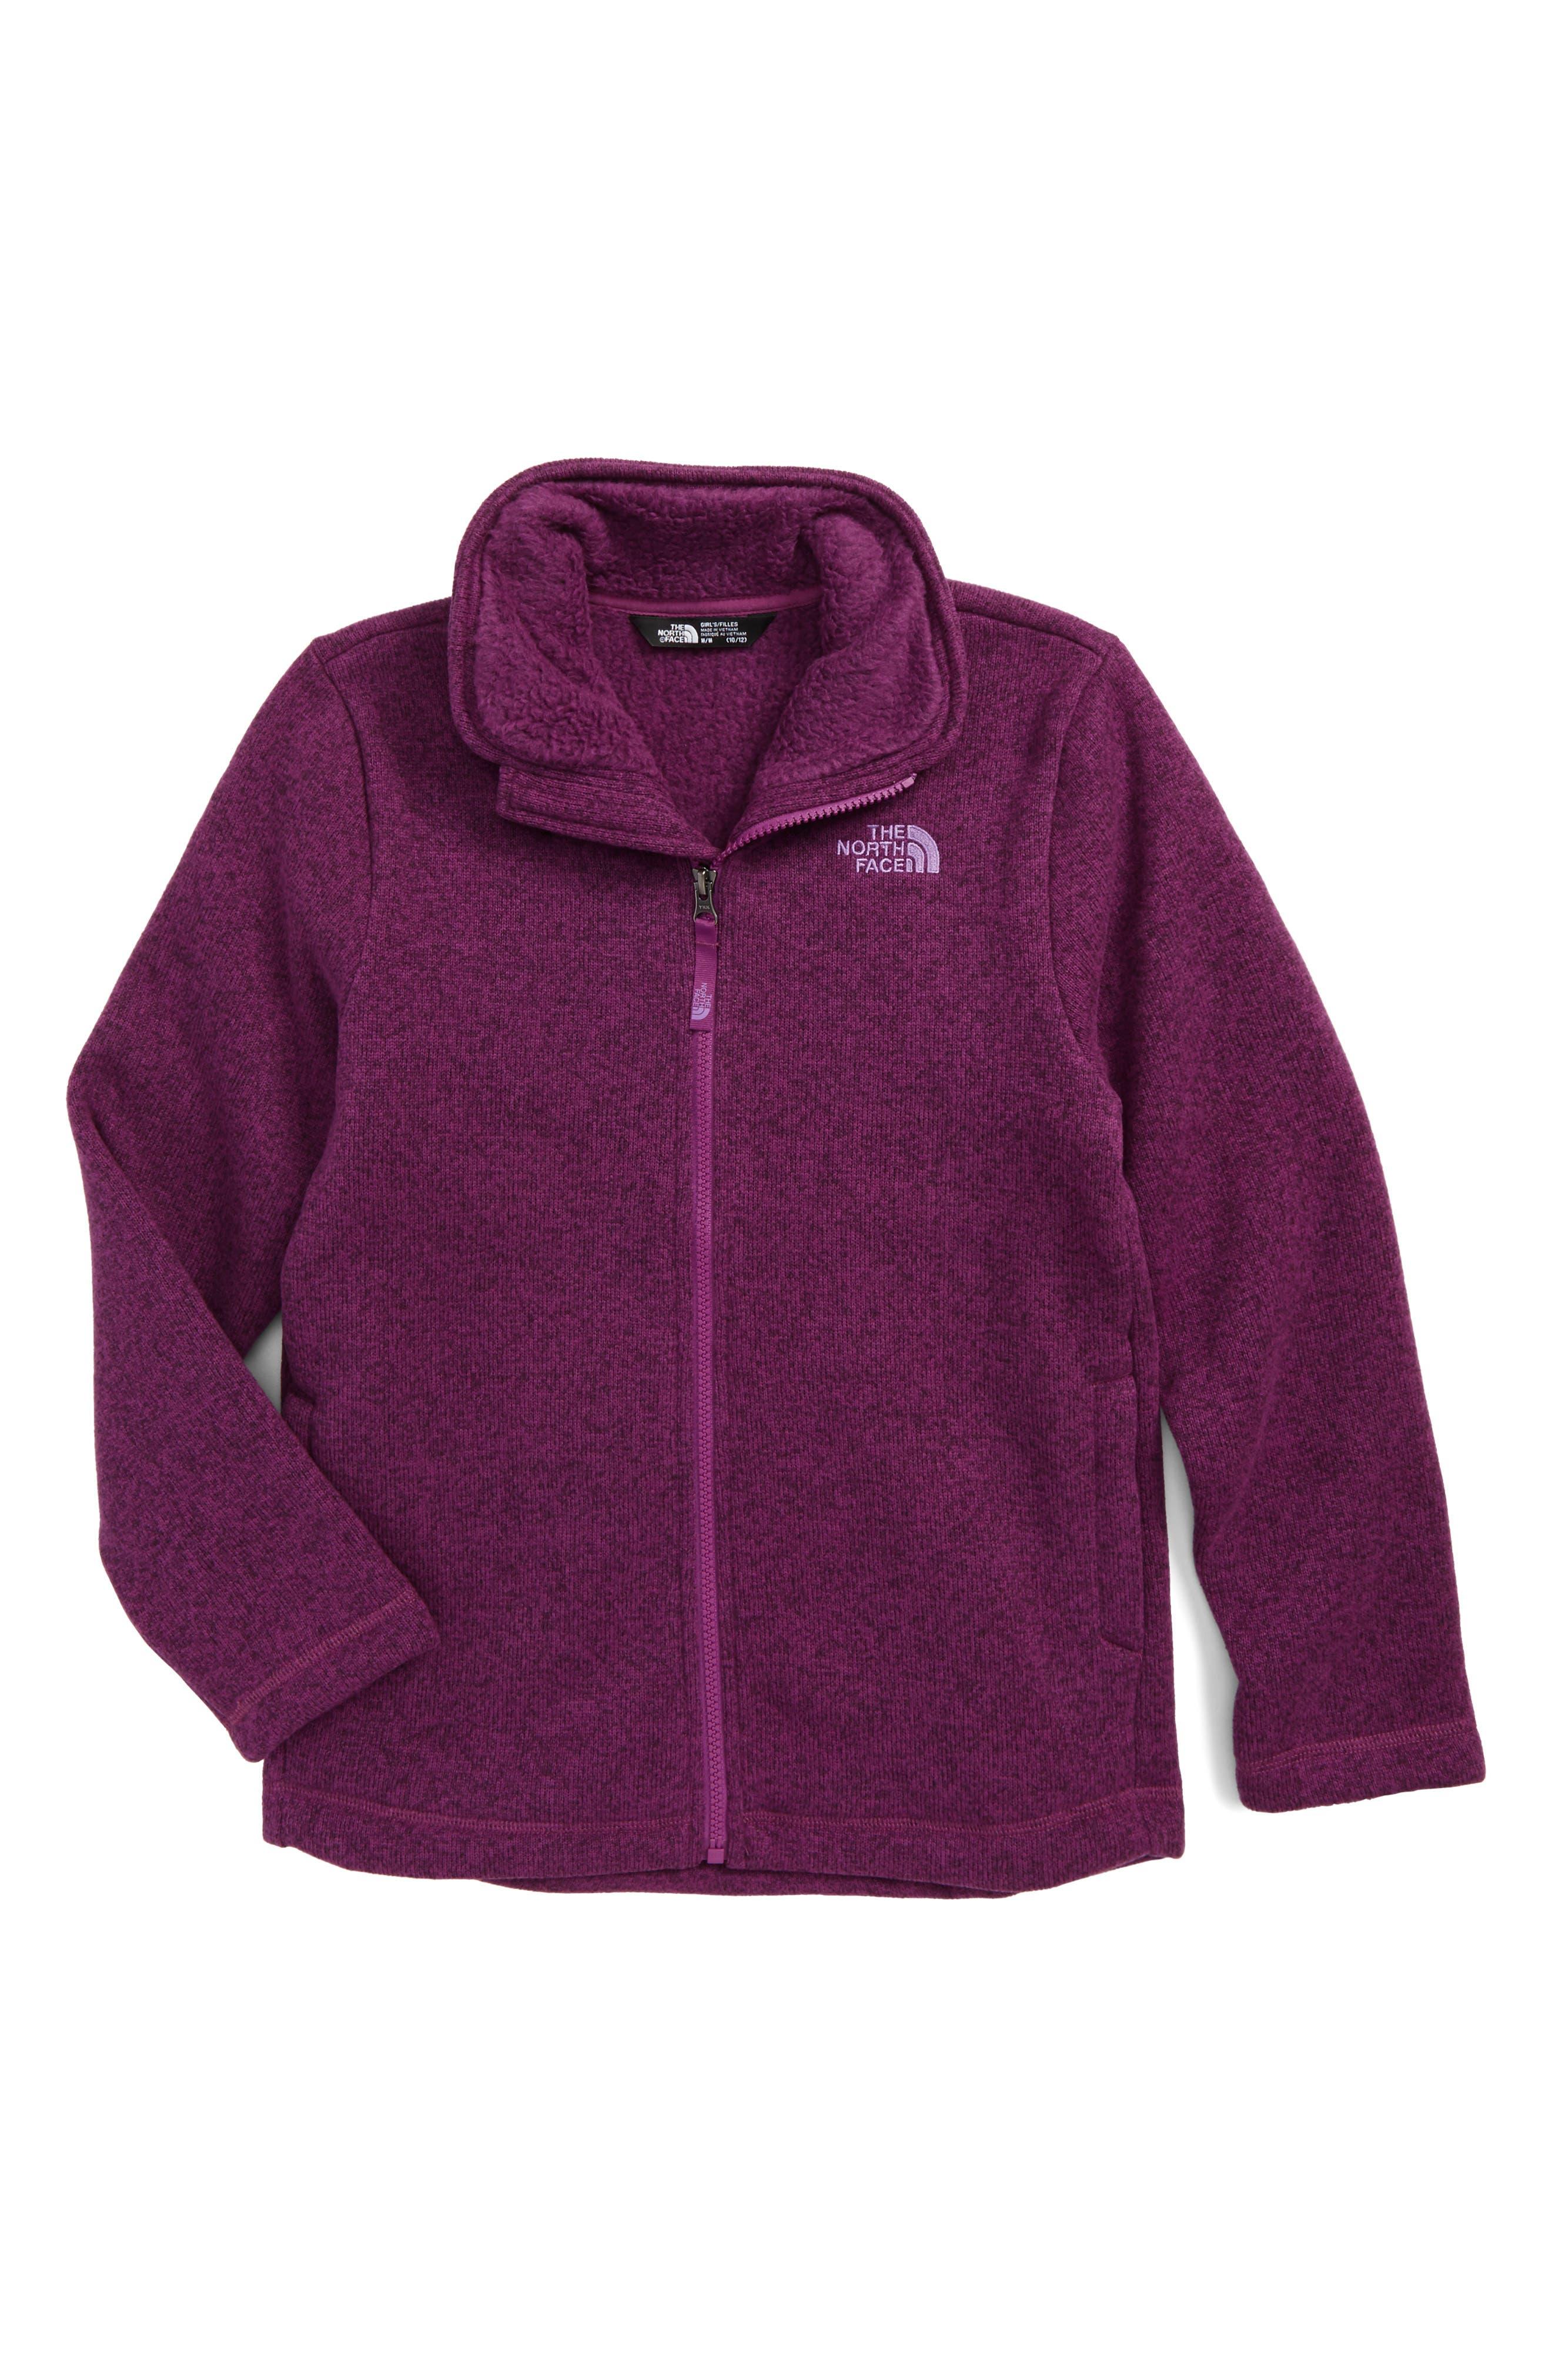 Main Image - The North Face Crescent Fleece Jacket (Little Girls & Big Girls)